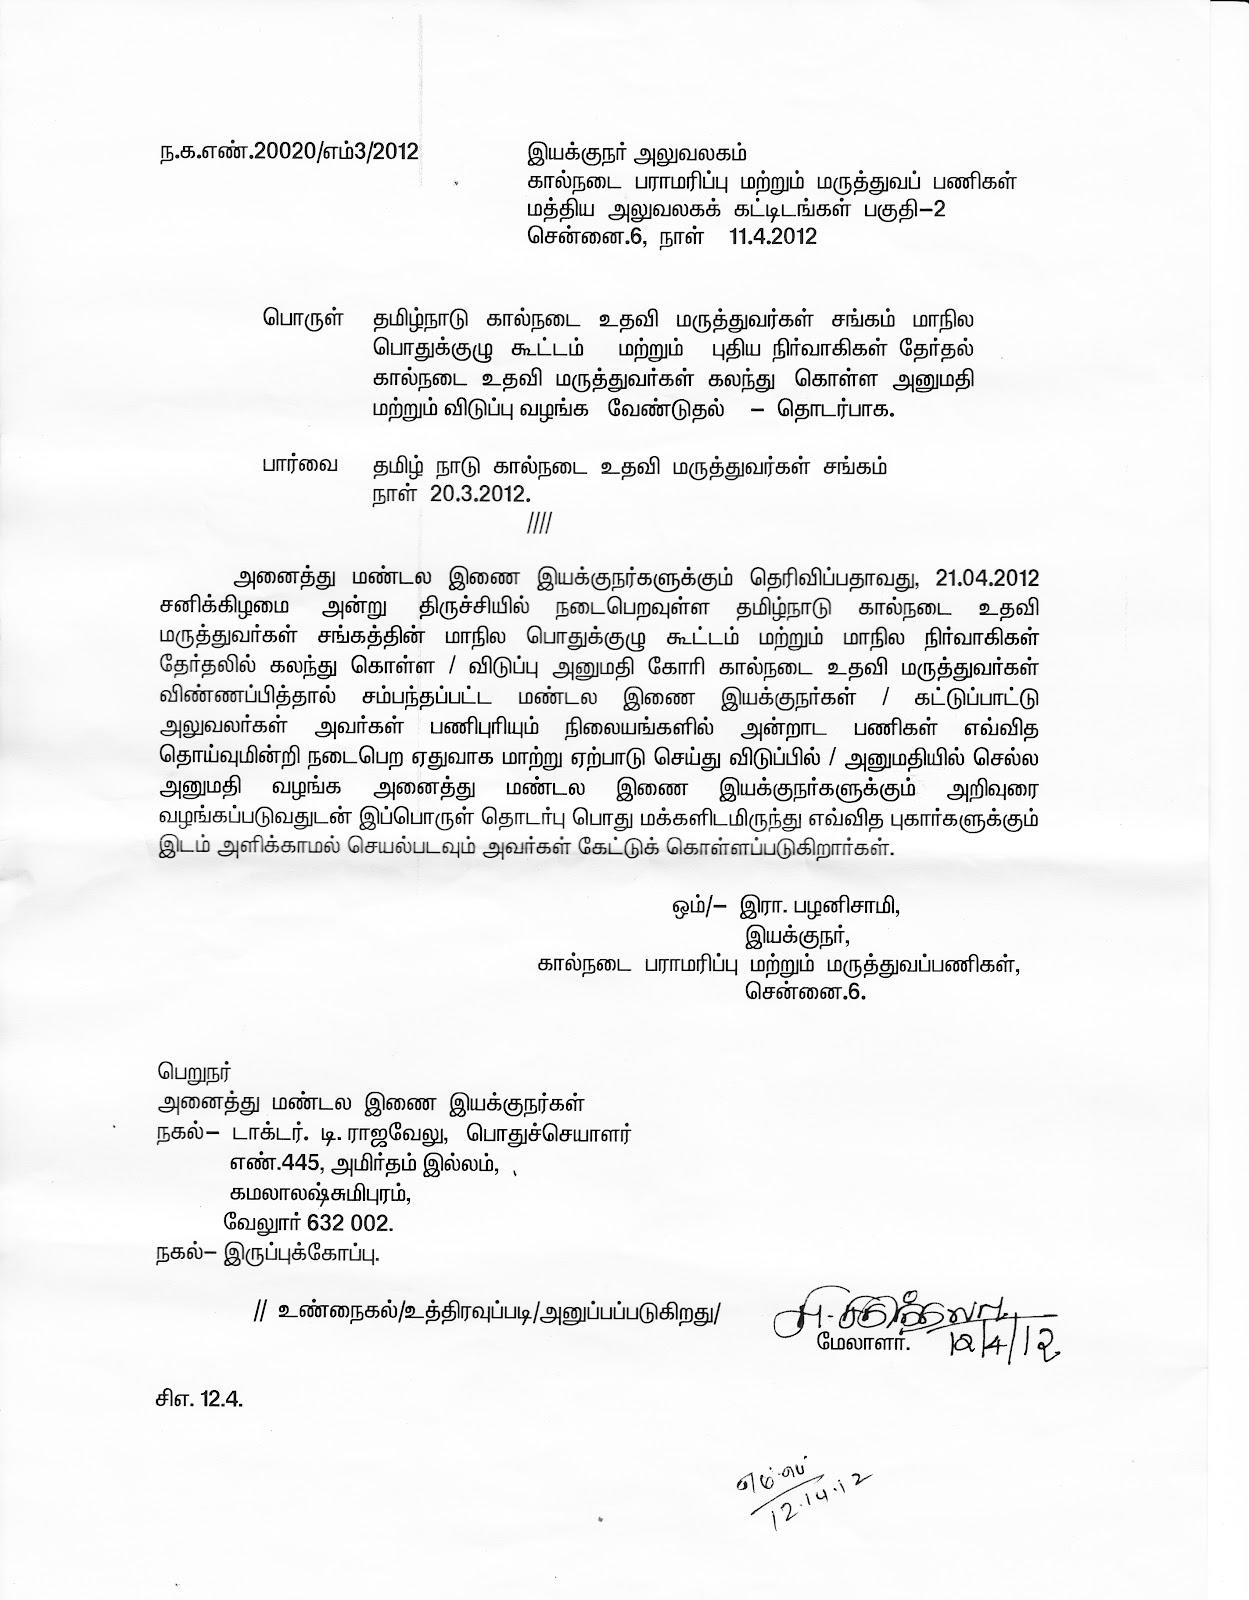 Permission Letter For 21 Apr 2012 GB And Election TNVASA